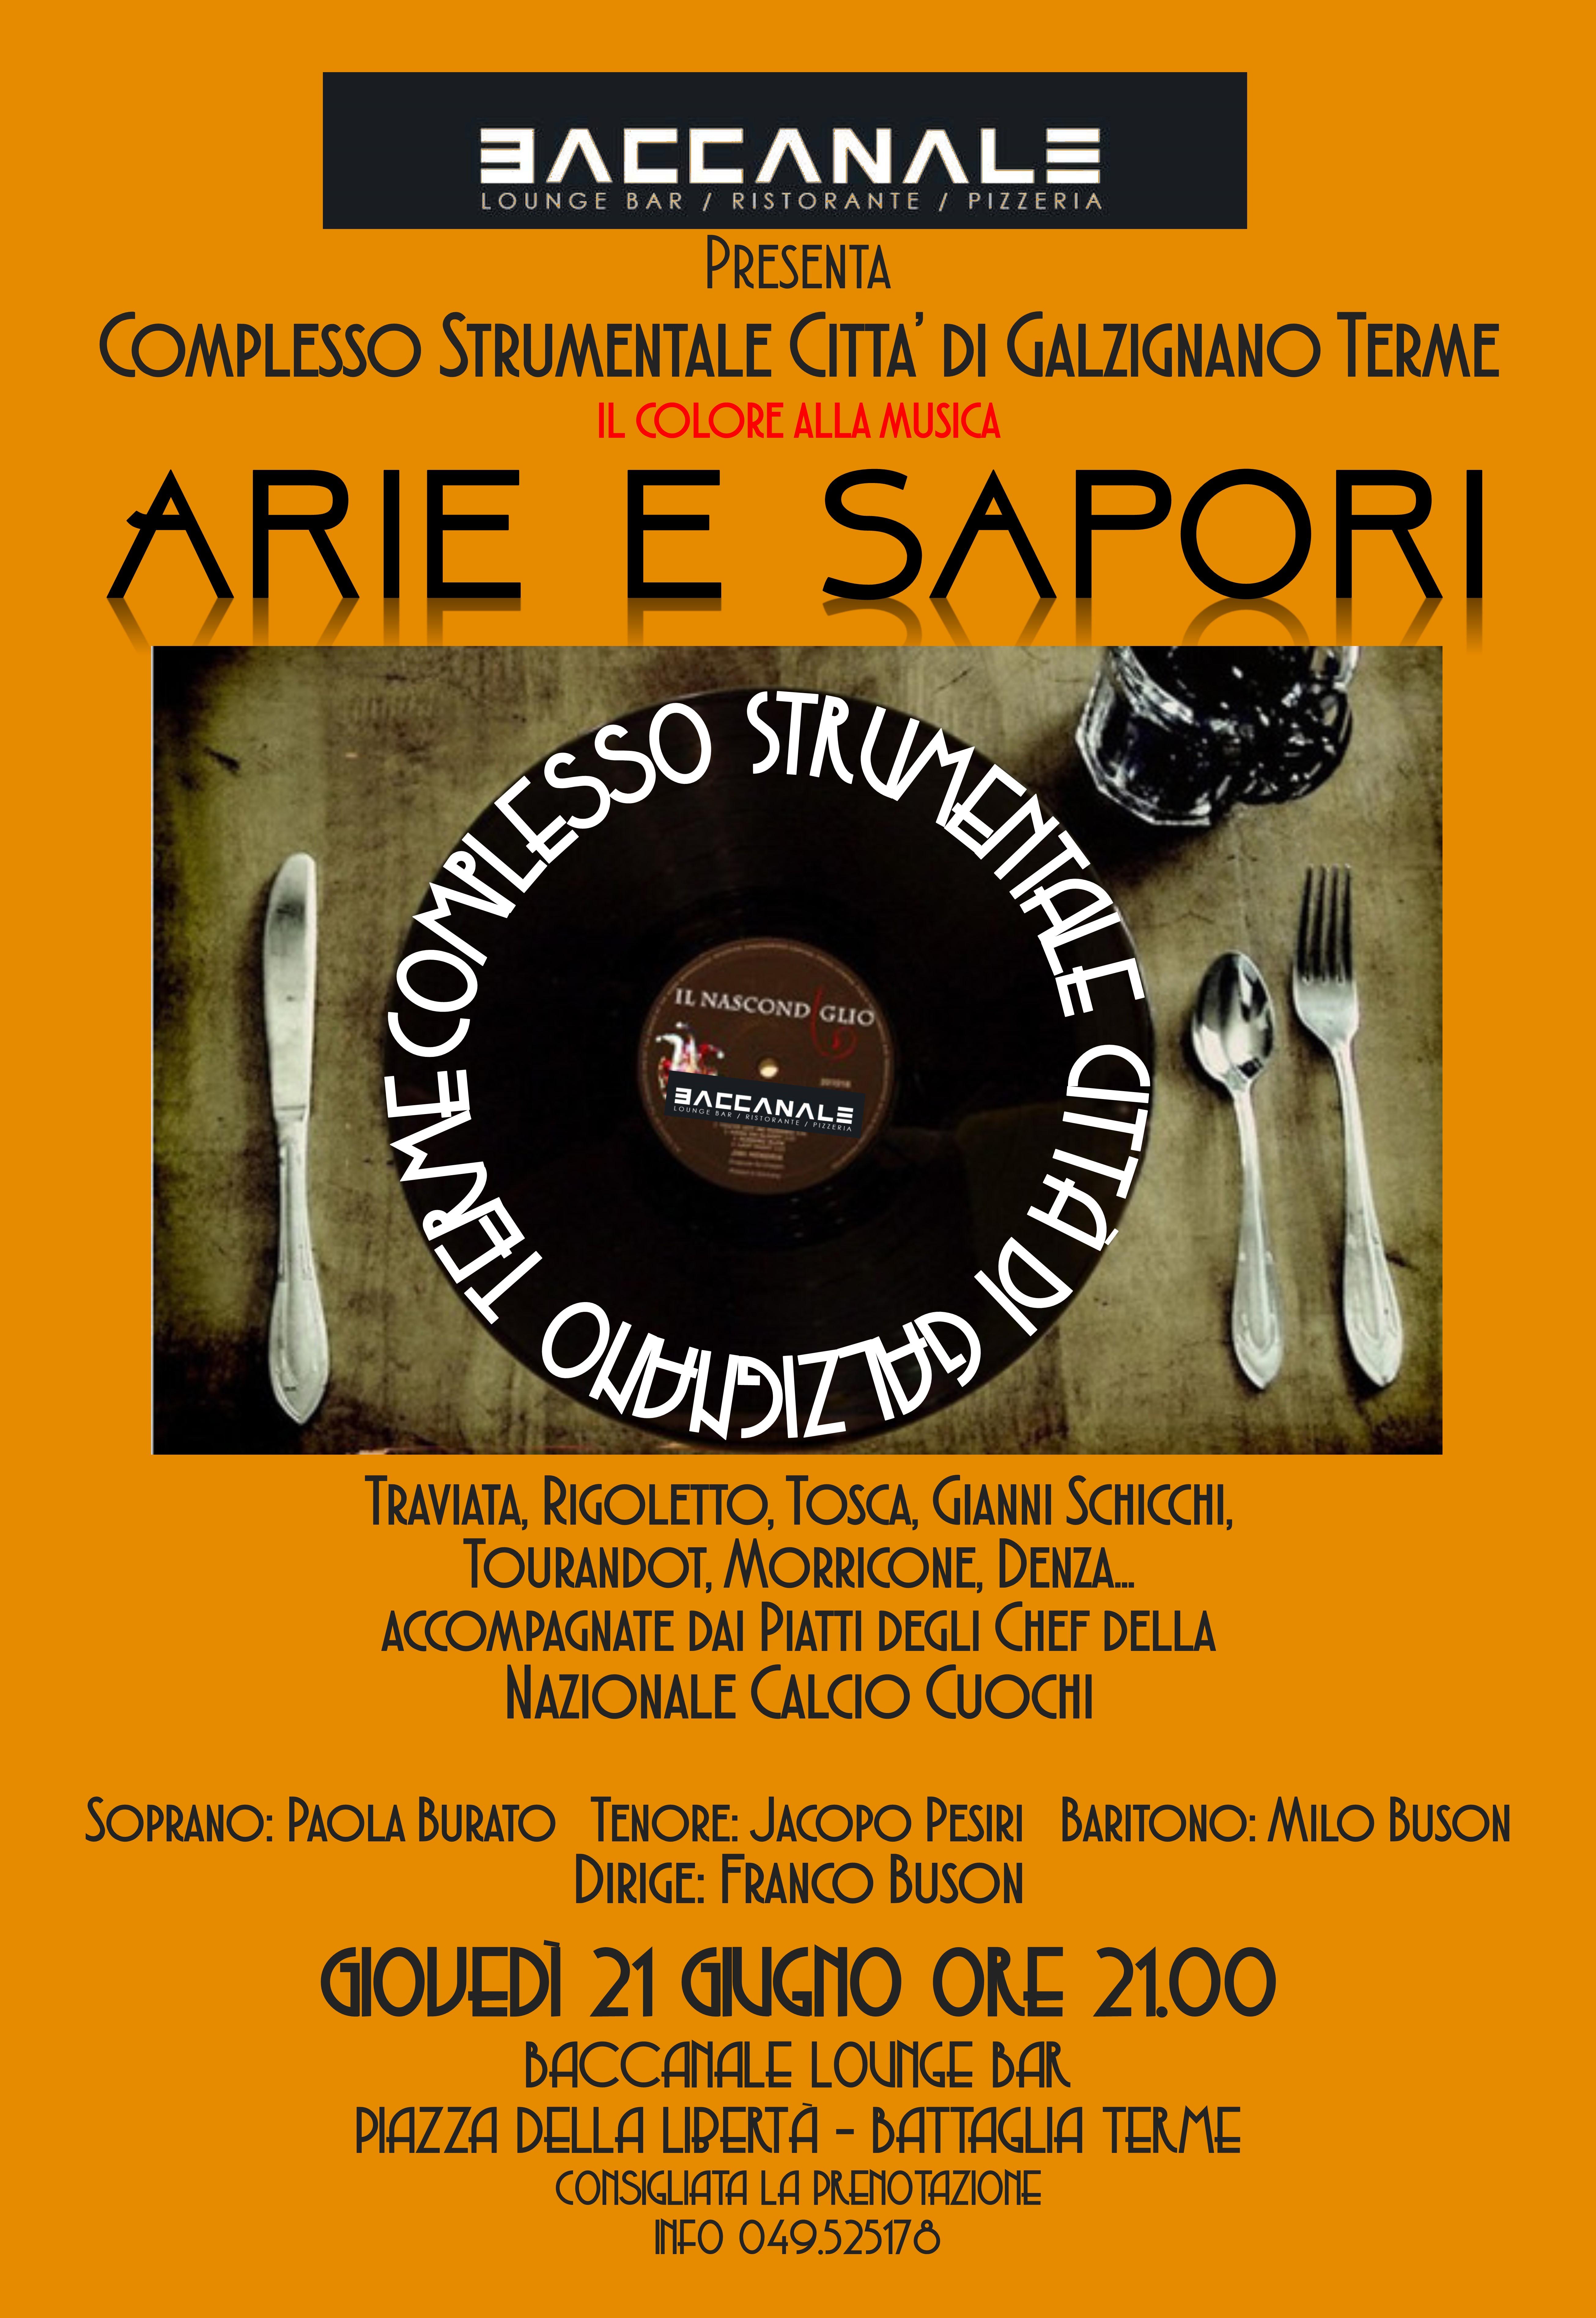 ARIE e SAPORI 21.06.2018